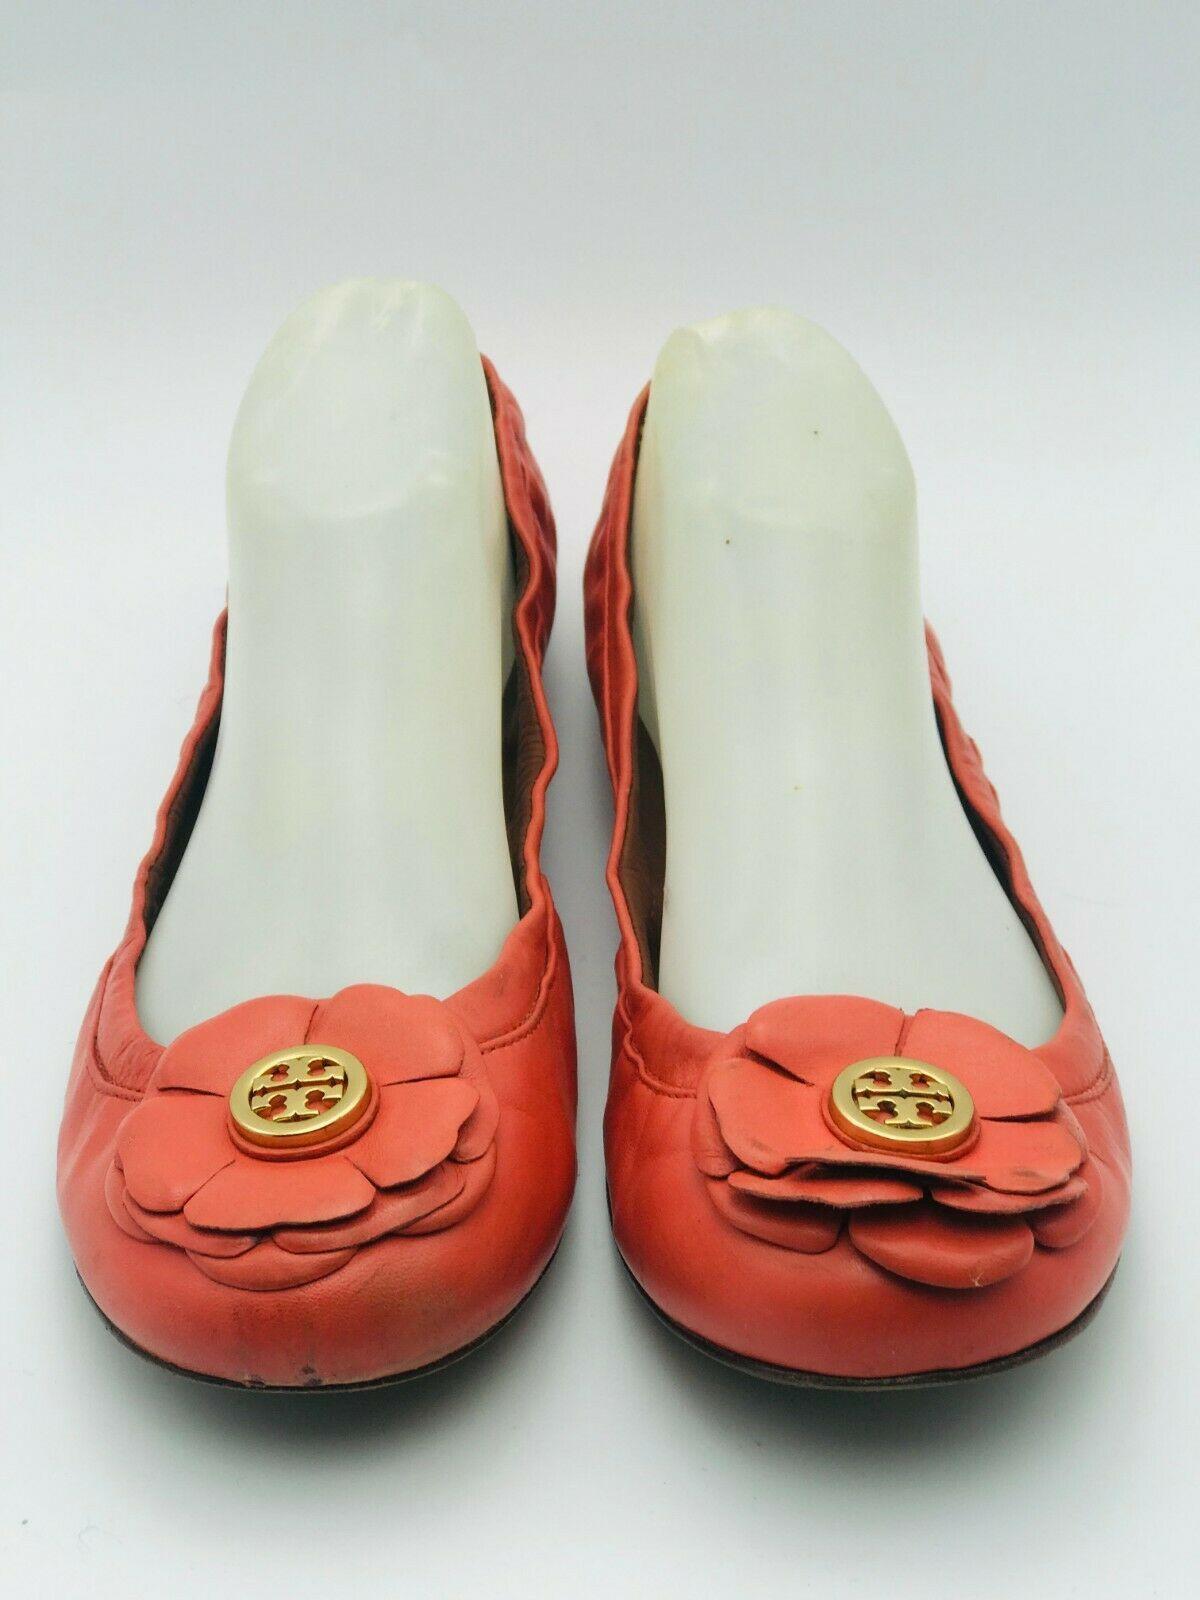 Tory Burch Shelby Peach Logo Ballerina Flat Women's Size 9M